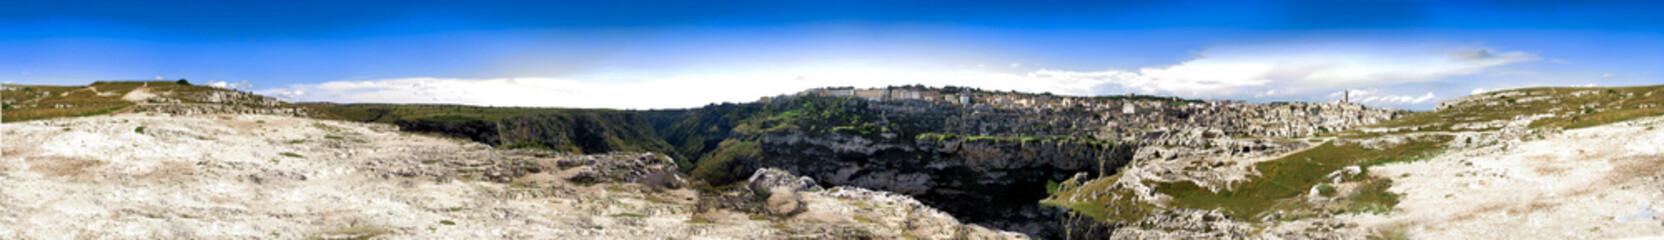 Panorama Italy -  Basilicata -  Matera